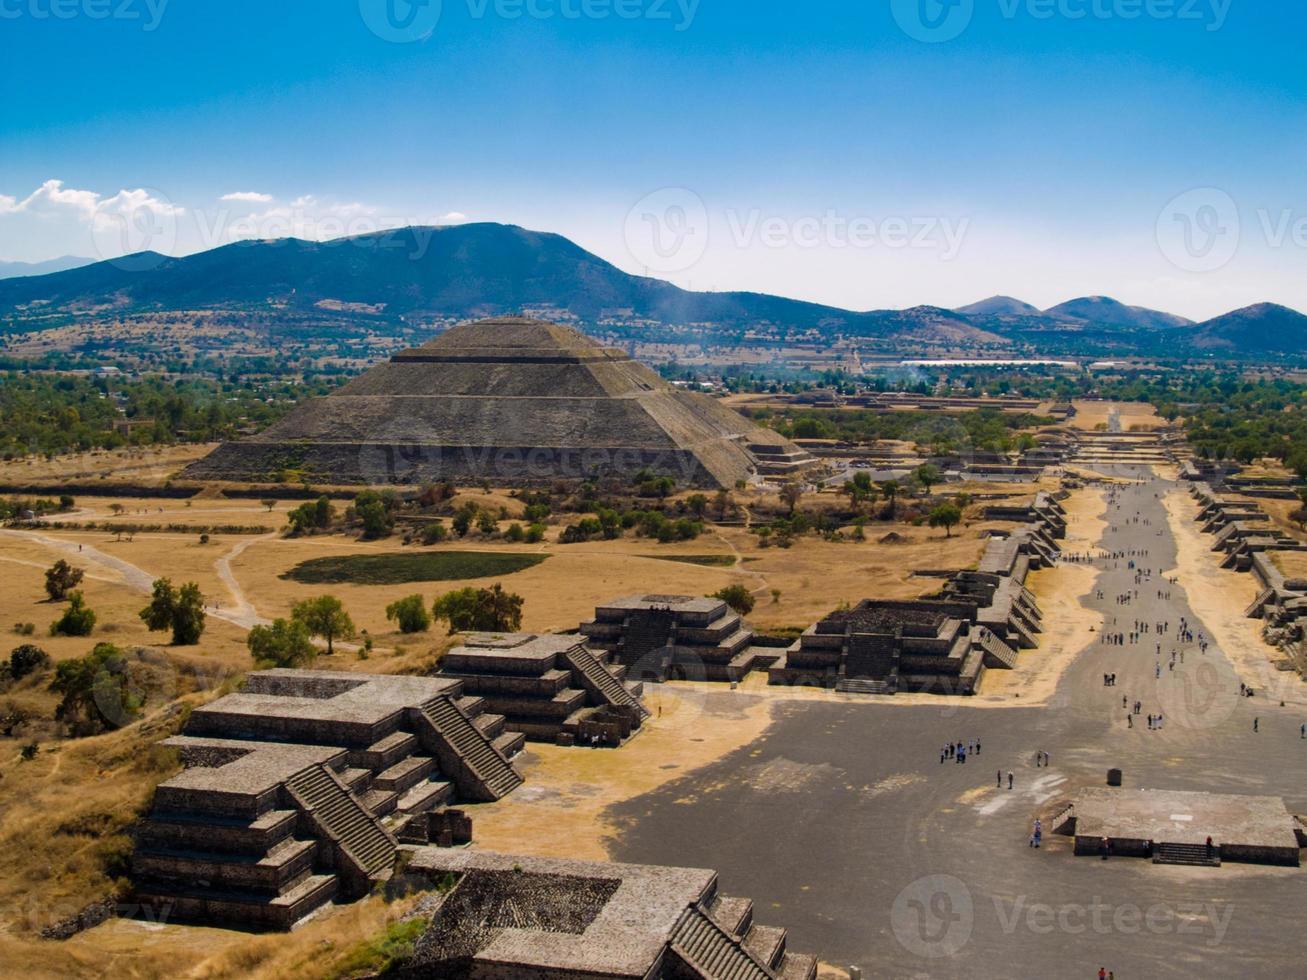 Beautiful photo of the Teotihuacan Pyramids